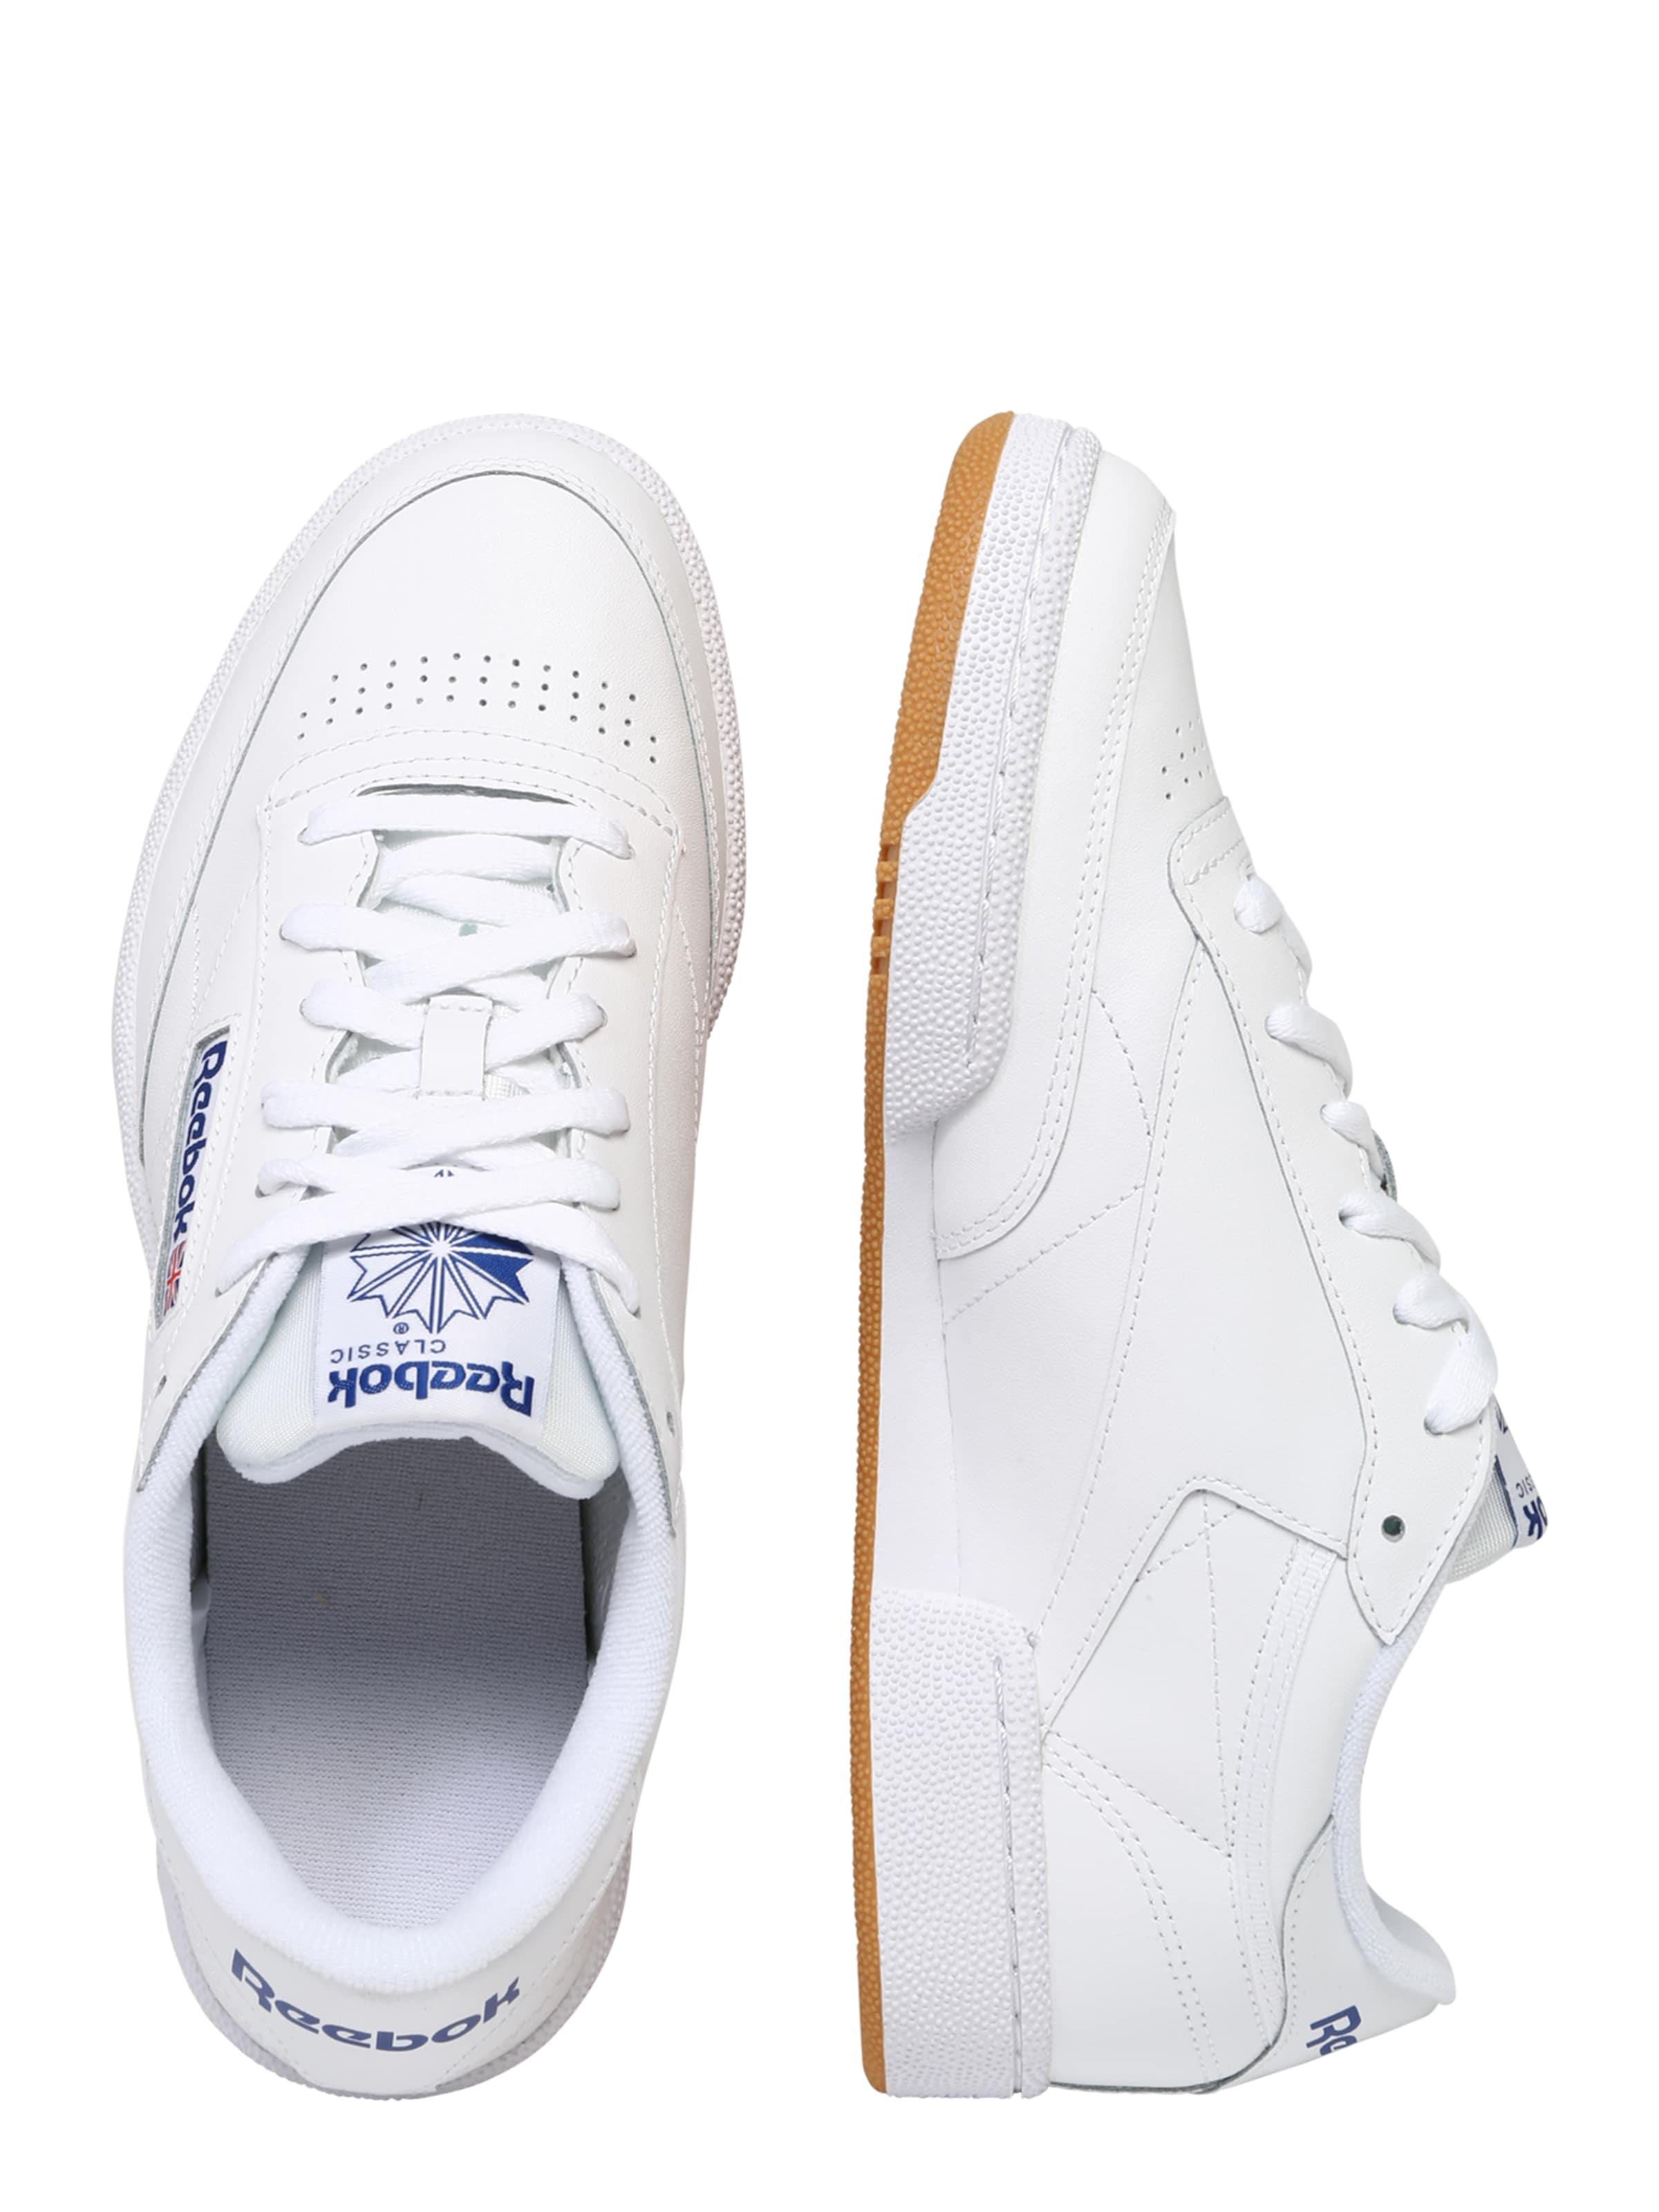 Classic Sneaker Reebok BlauRot Weiß In CdxshQrt